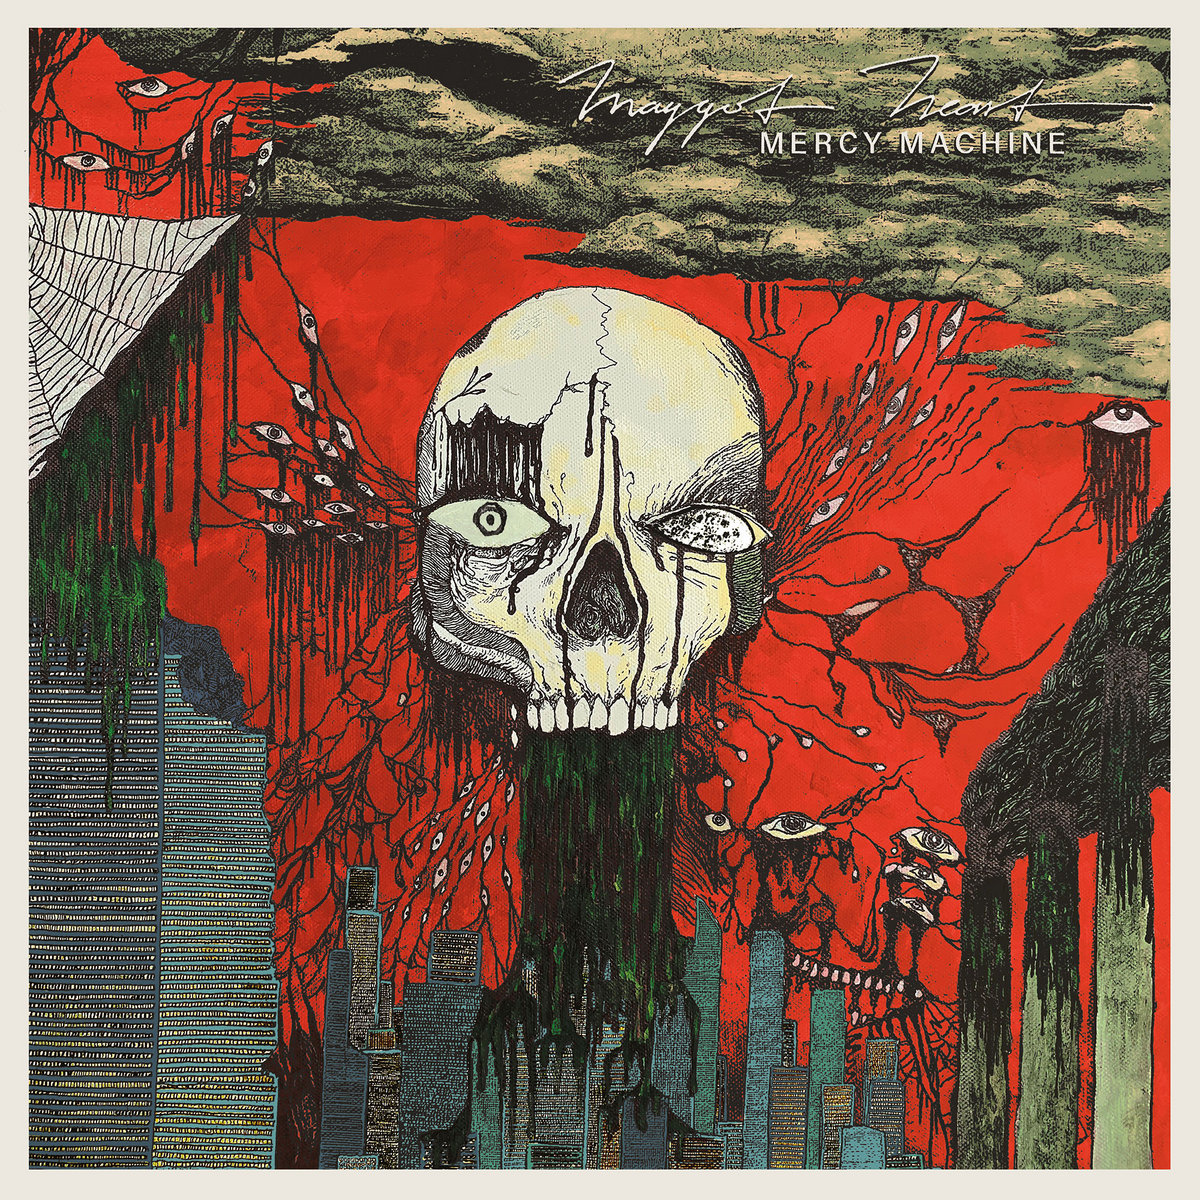 Maggot Heart: Asfalto, Oscuridad y Guitarras Maggot-heart-mercy-machine